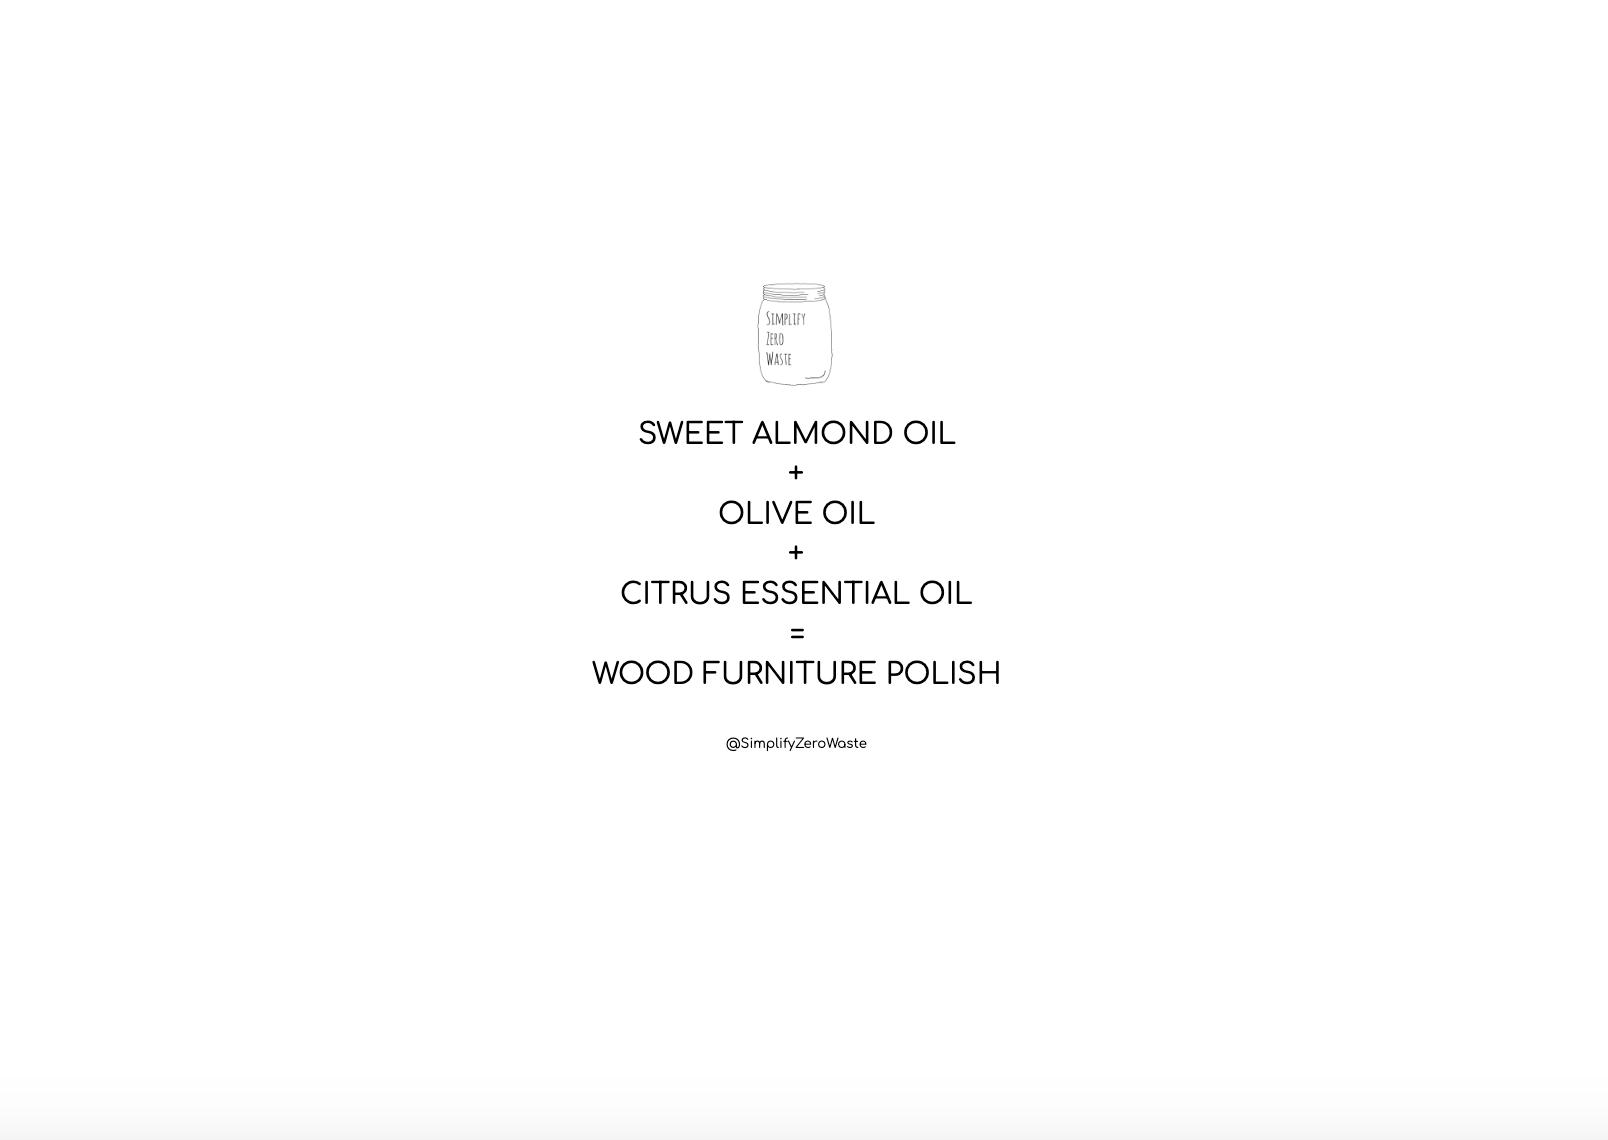 wood furniture polish.png